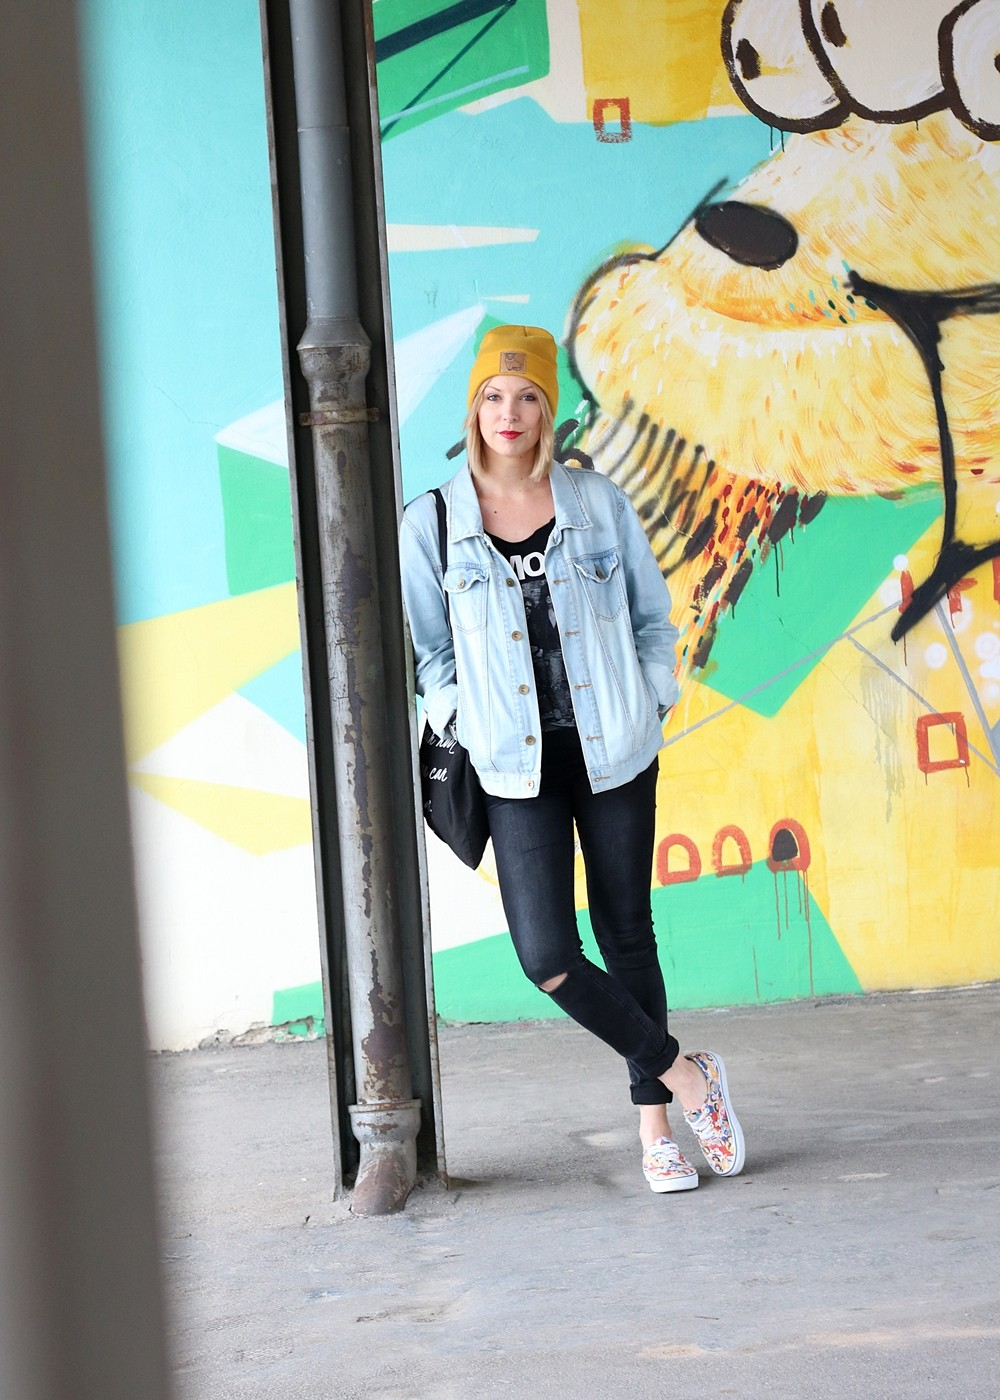 Fahionblogger Outfit Vans Disney Jeansjacke Beanie Fuchs Weebit (14)